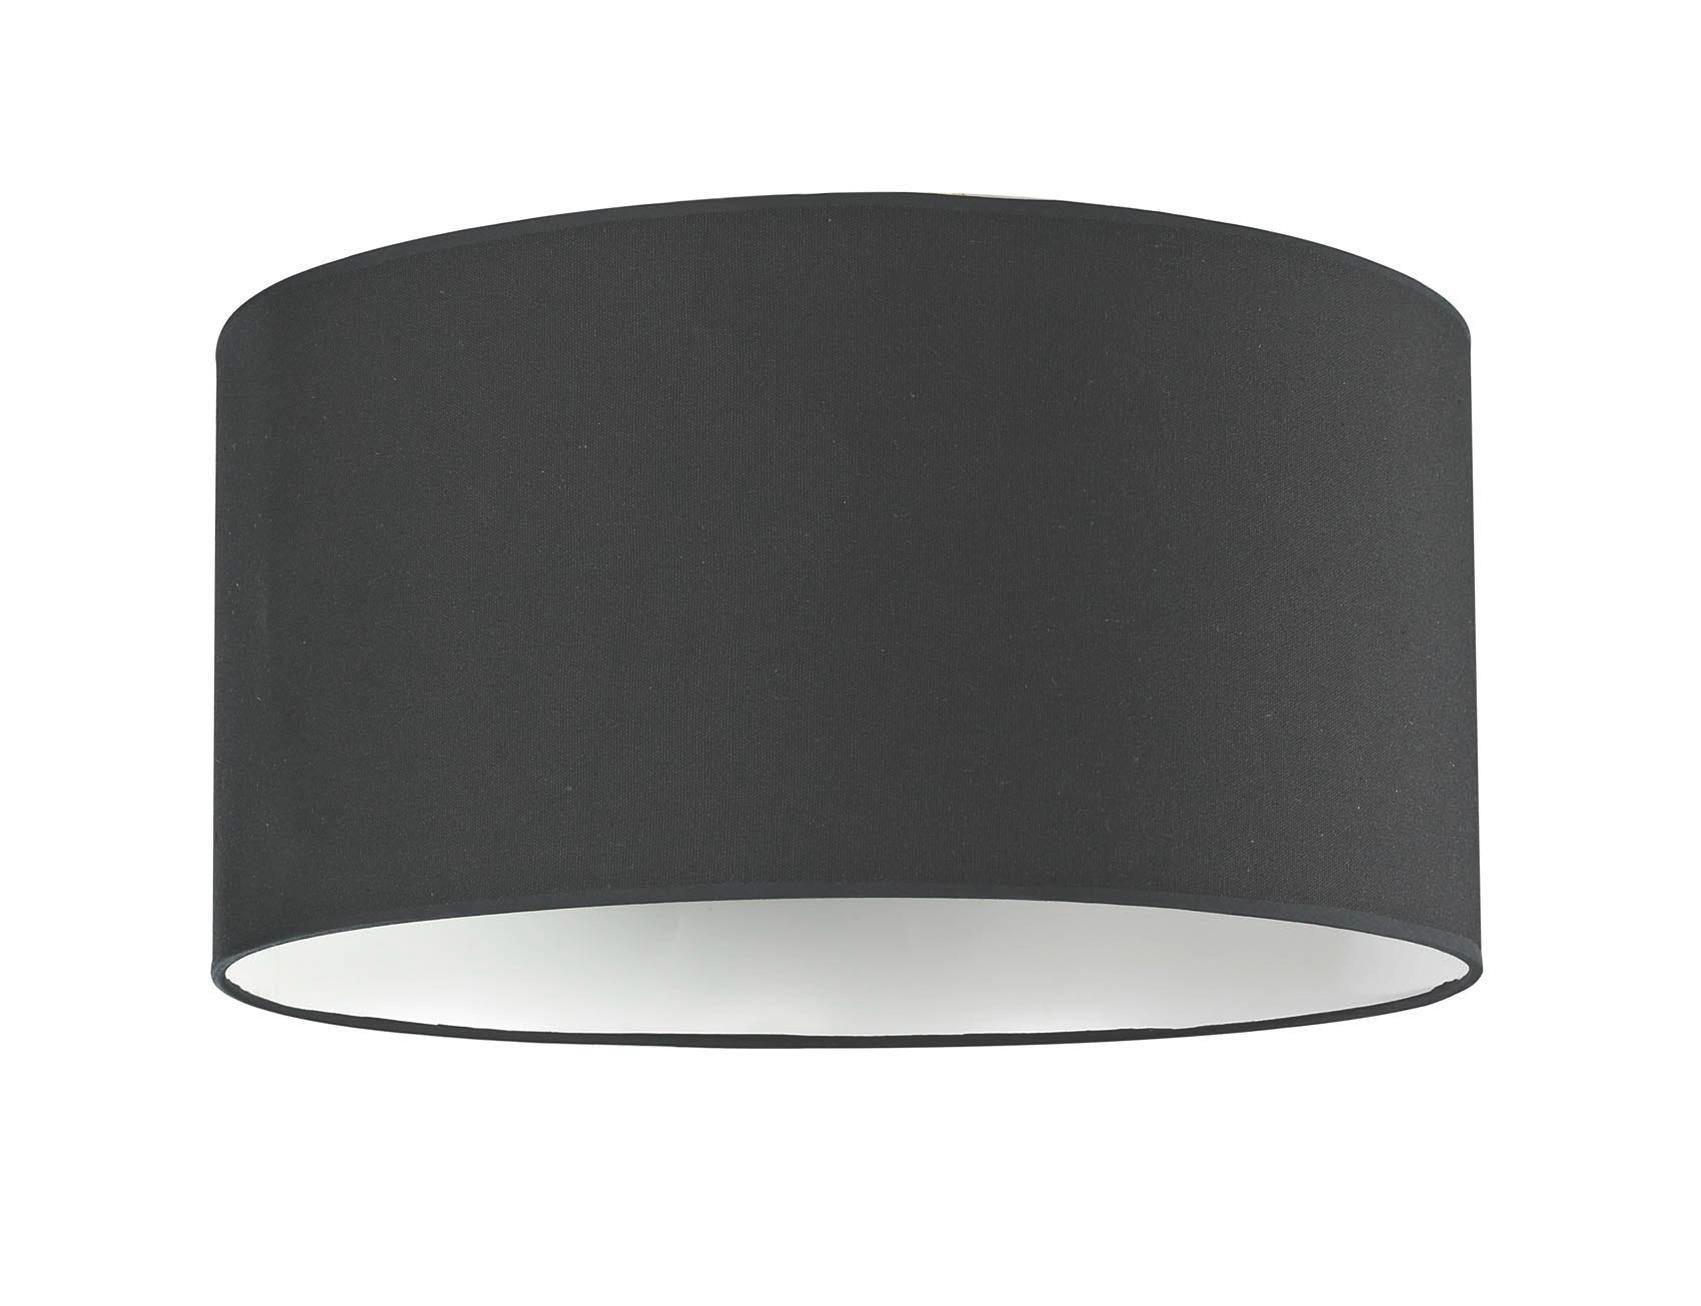 Stínítko Svítidla Arno - černá, kov/textil (50/50/25cm) - MÖMAX modern living